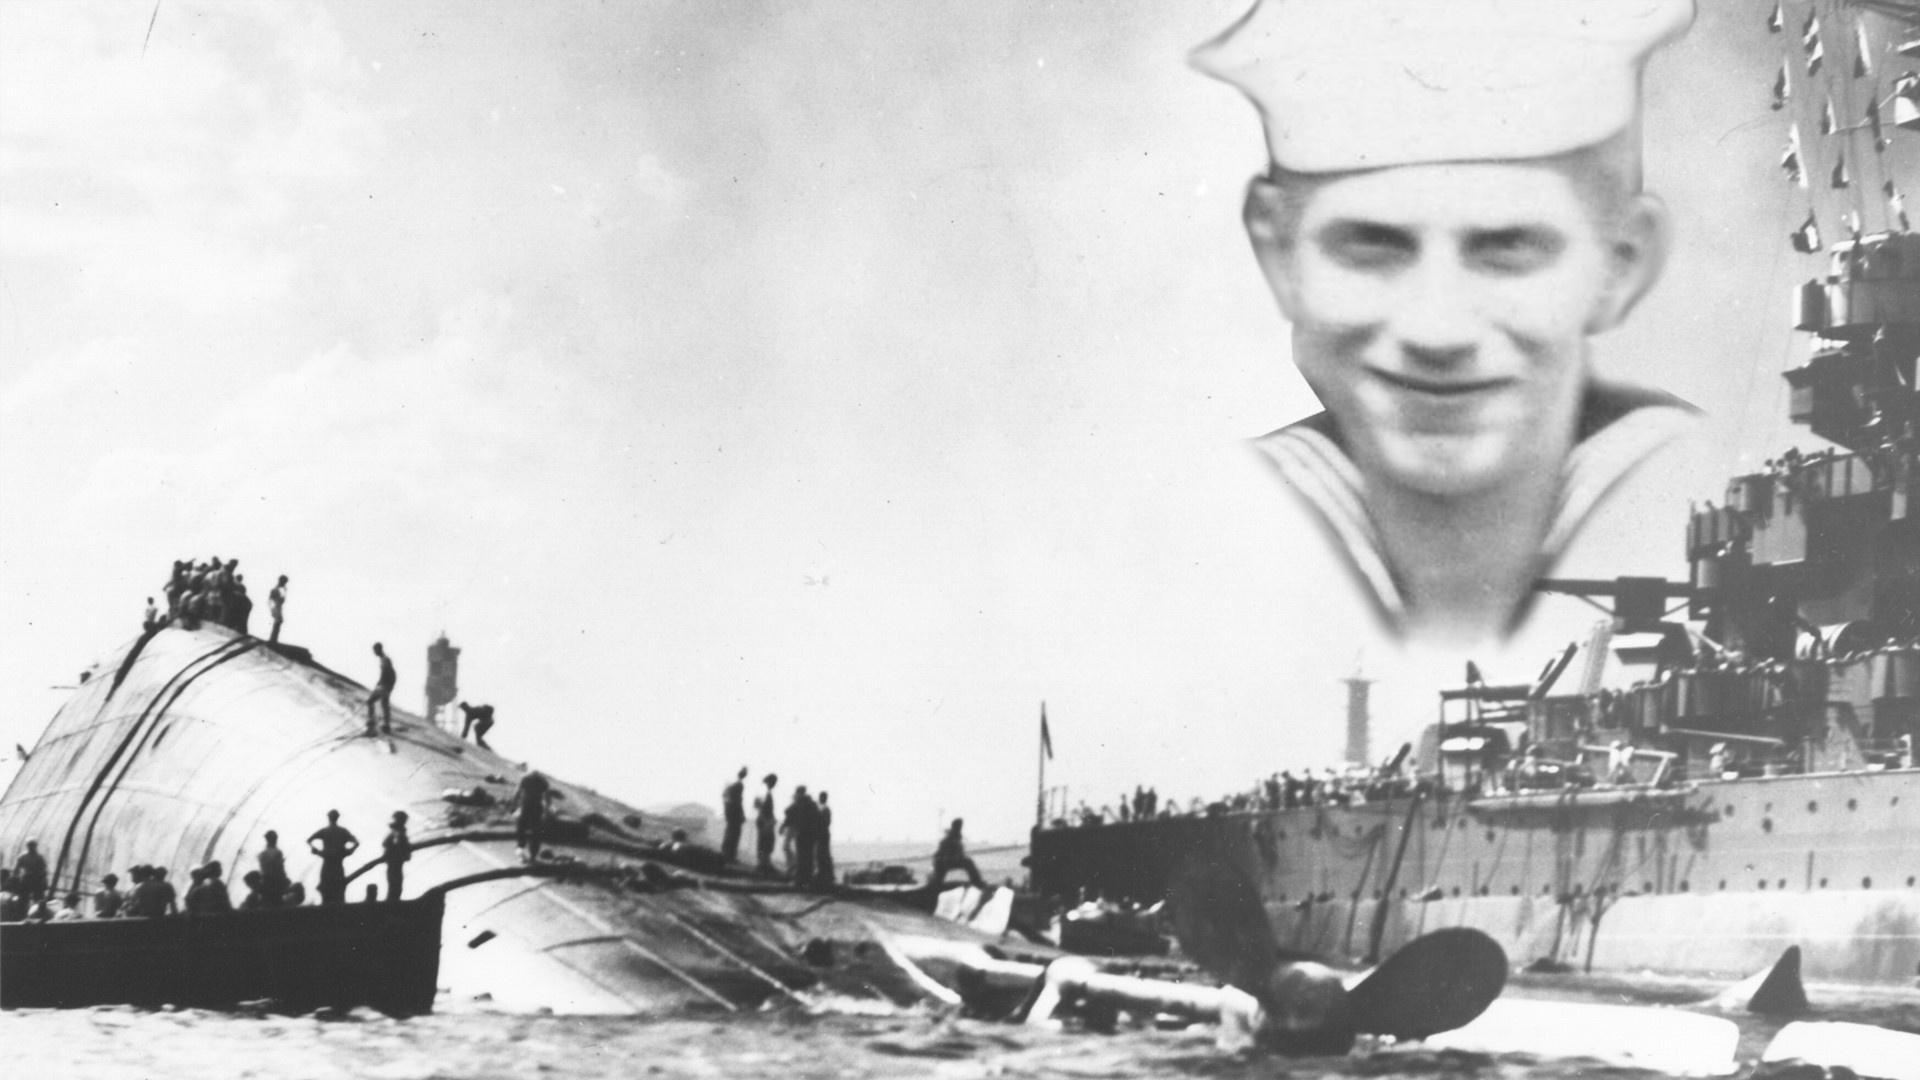 The War Story of Earl Paul Baum